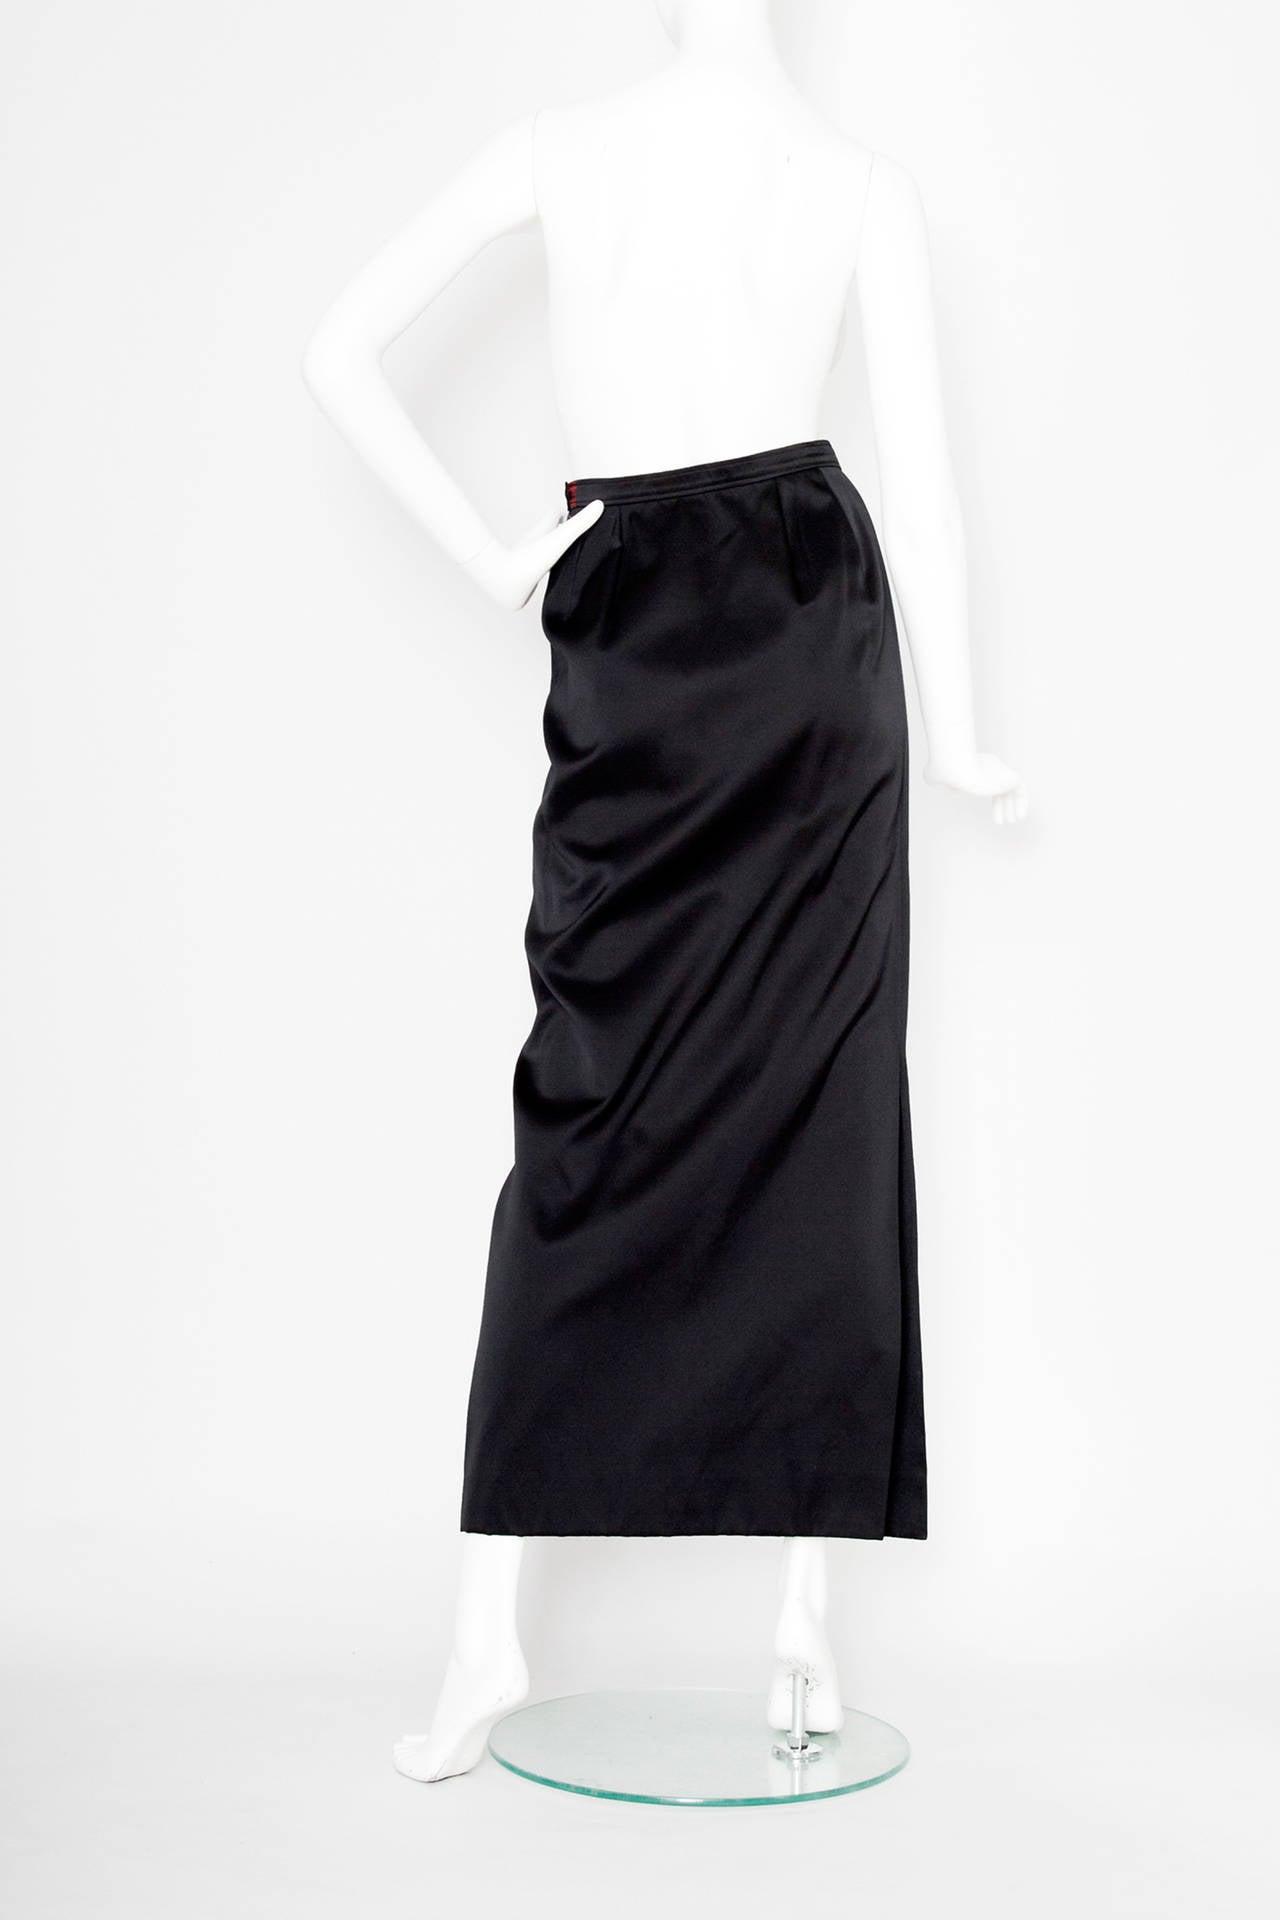 1990s Yves Saint Laurent Black Silk Satin Evening Skirt In Excellent Condition For Sale In Copenhagen, DK